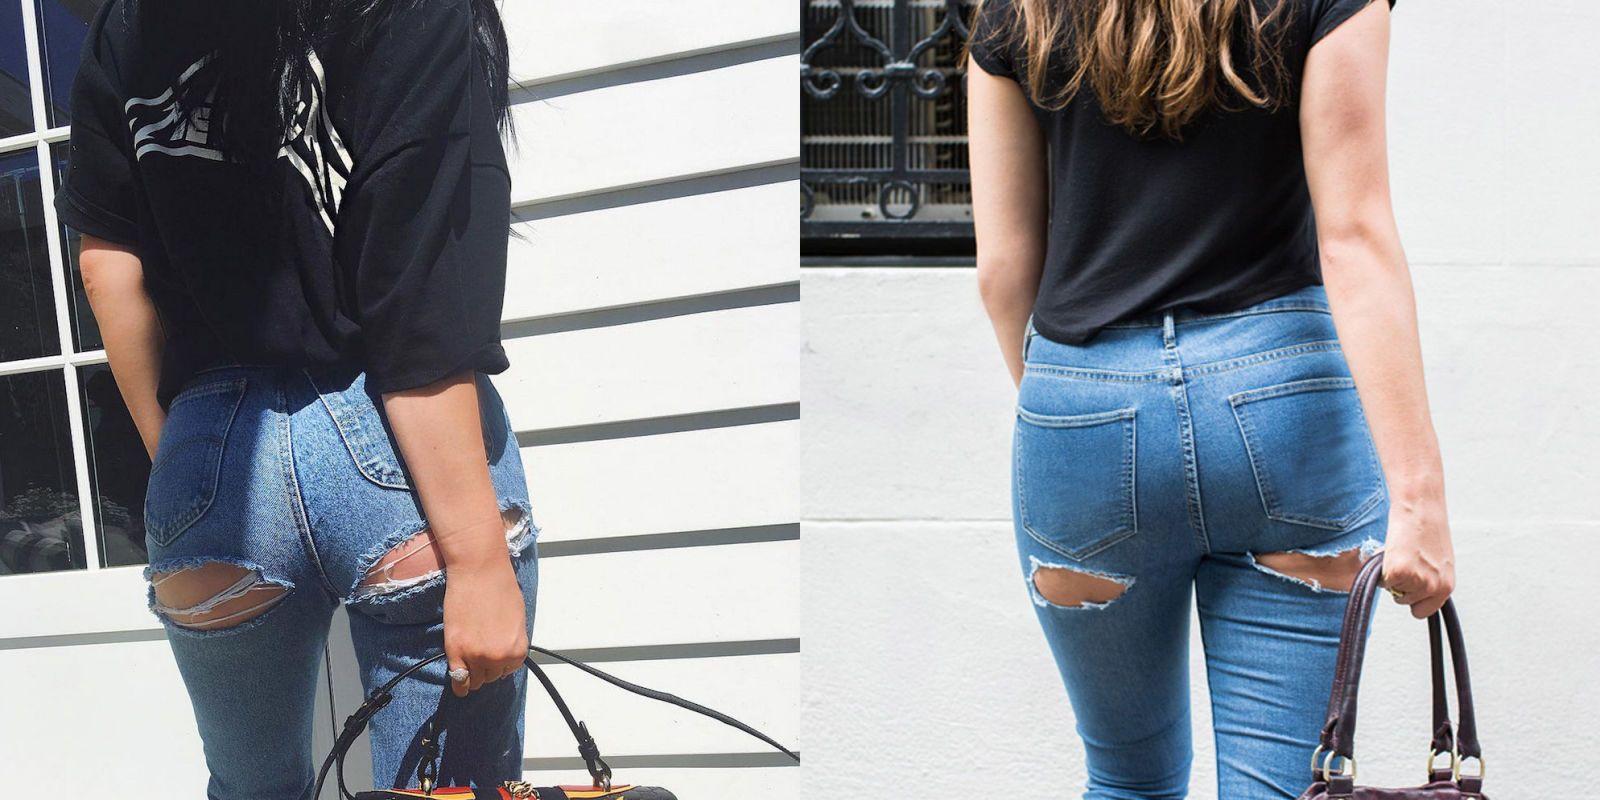 Super milfy ass in jeans